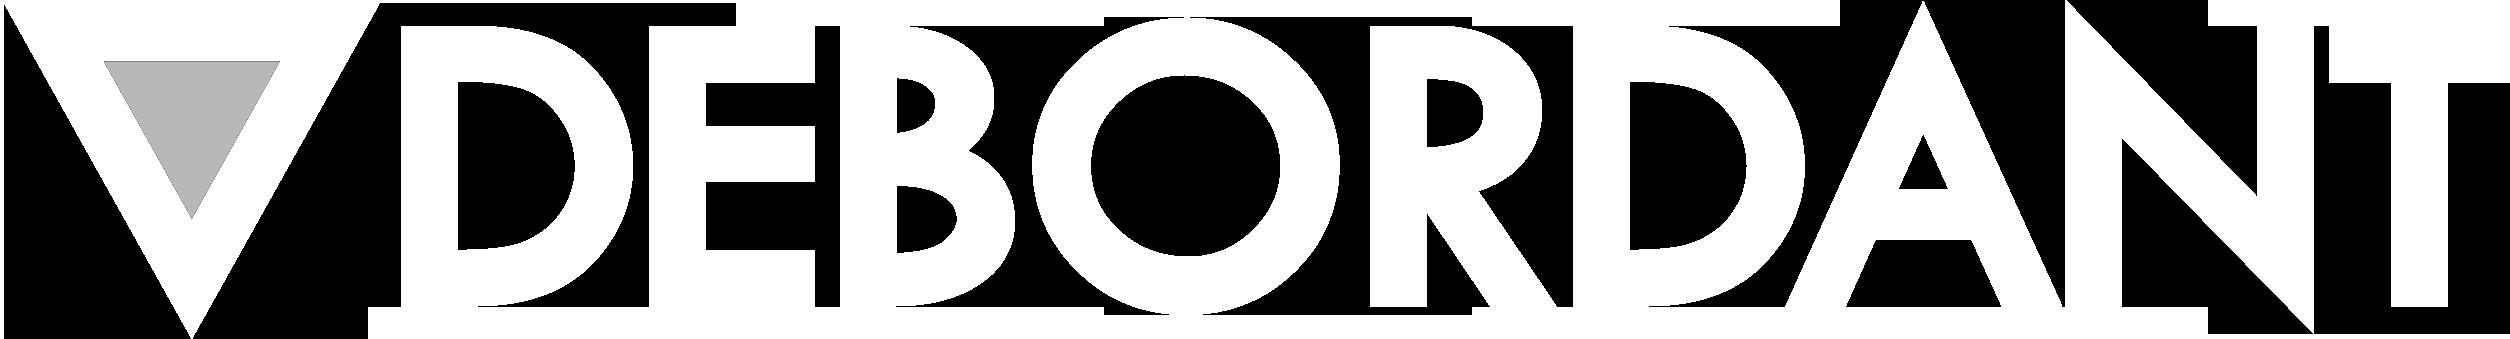 DEBORDANT